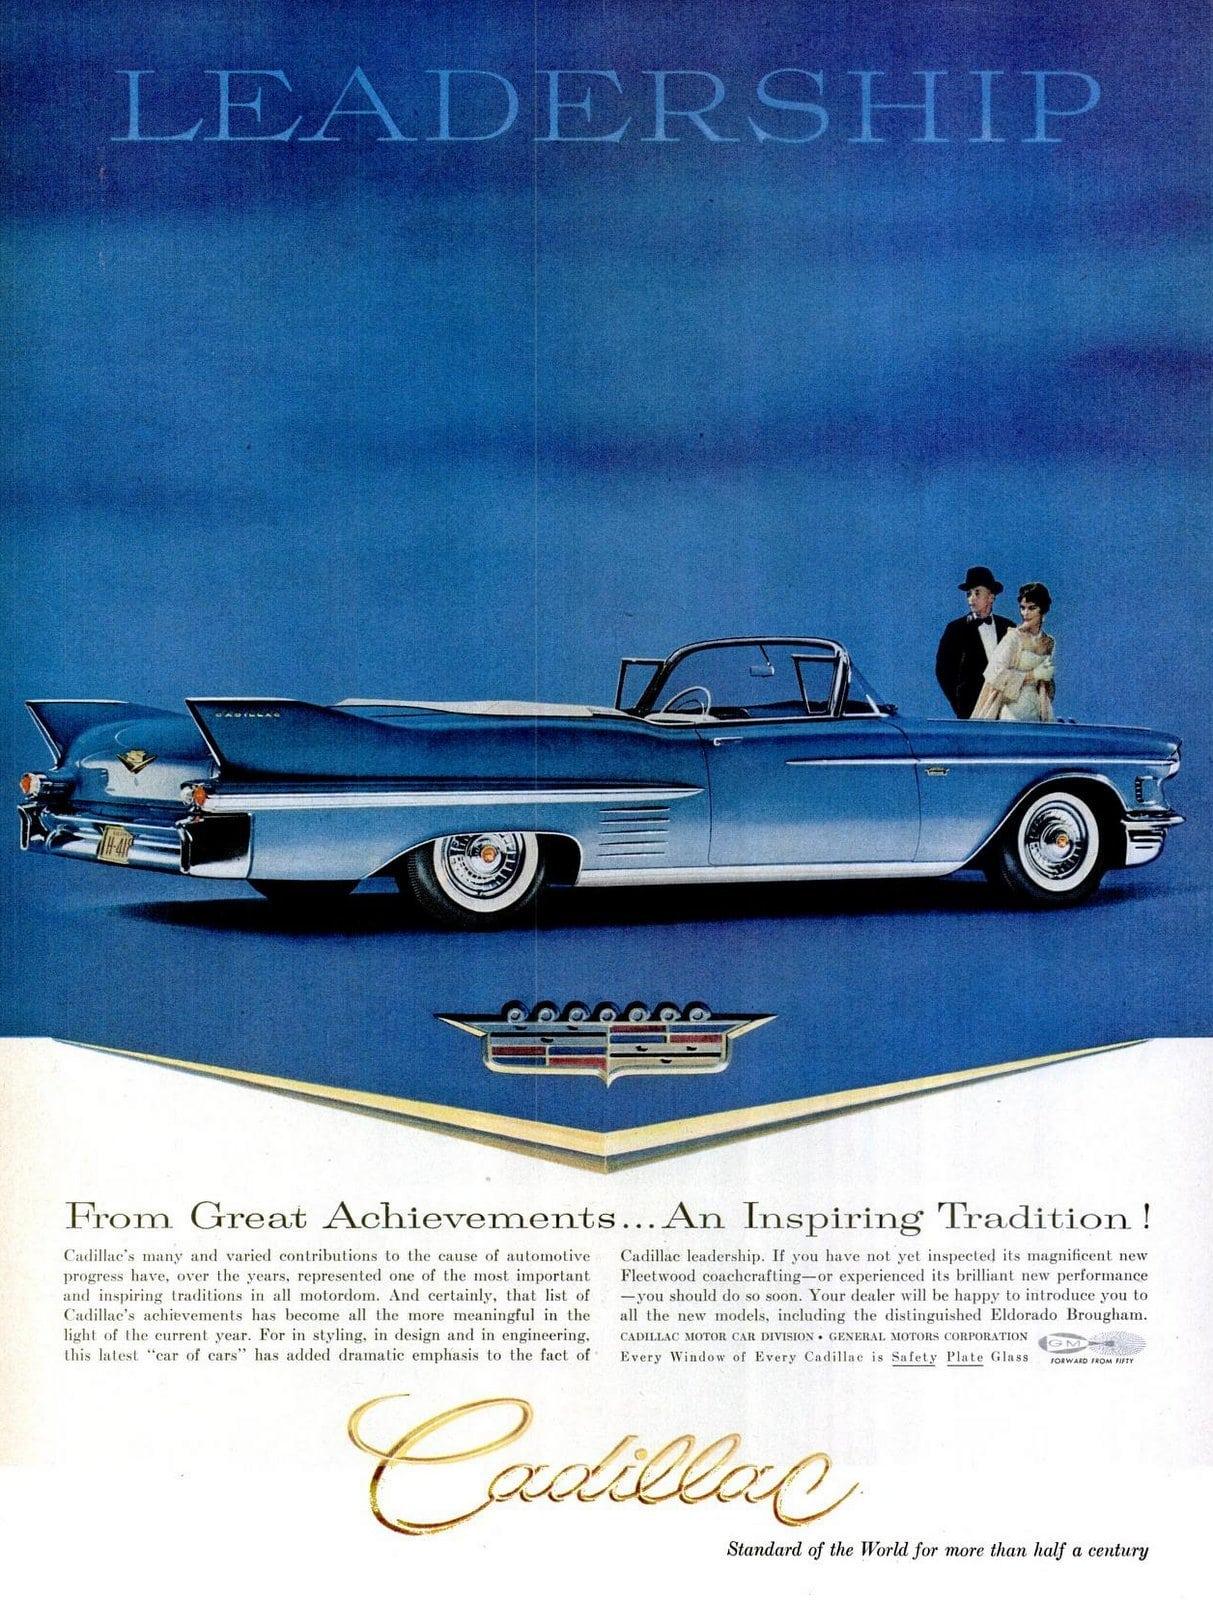 1958 Cadillac cars